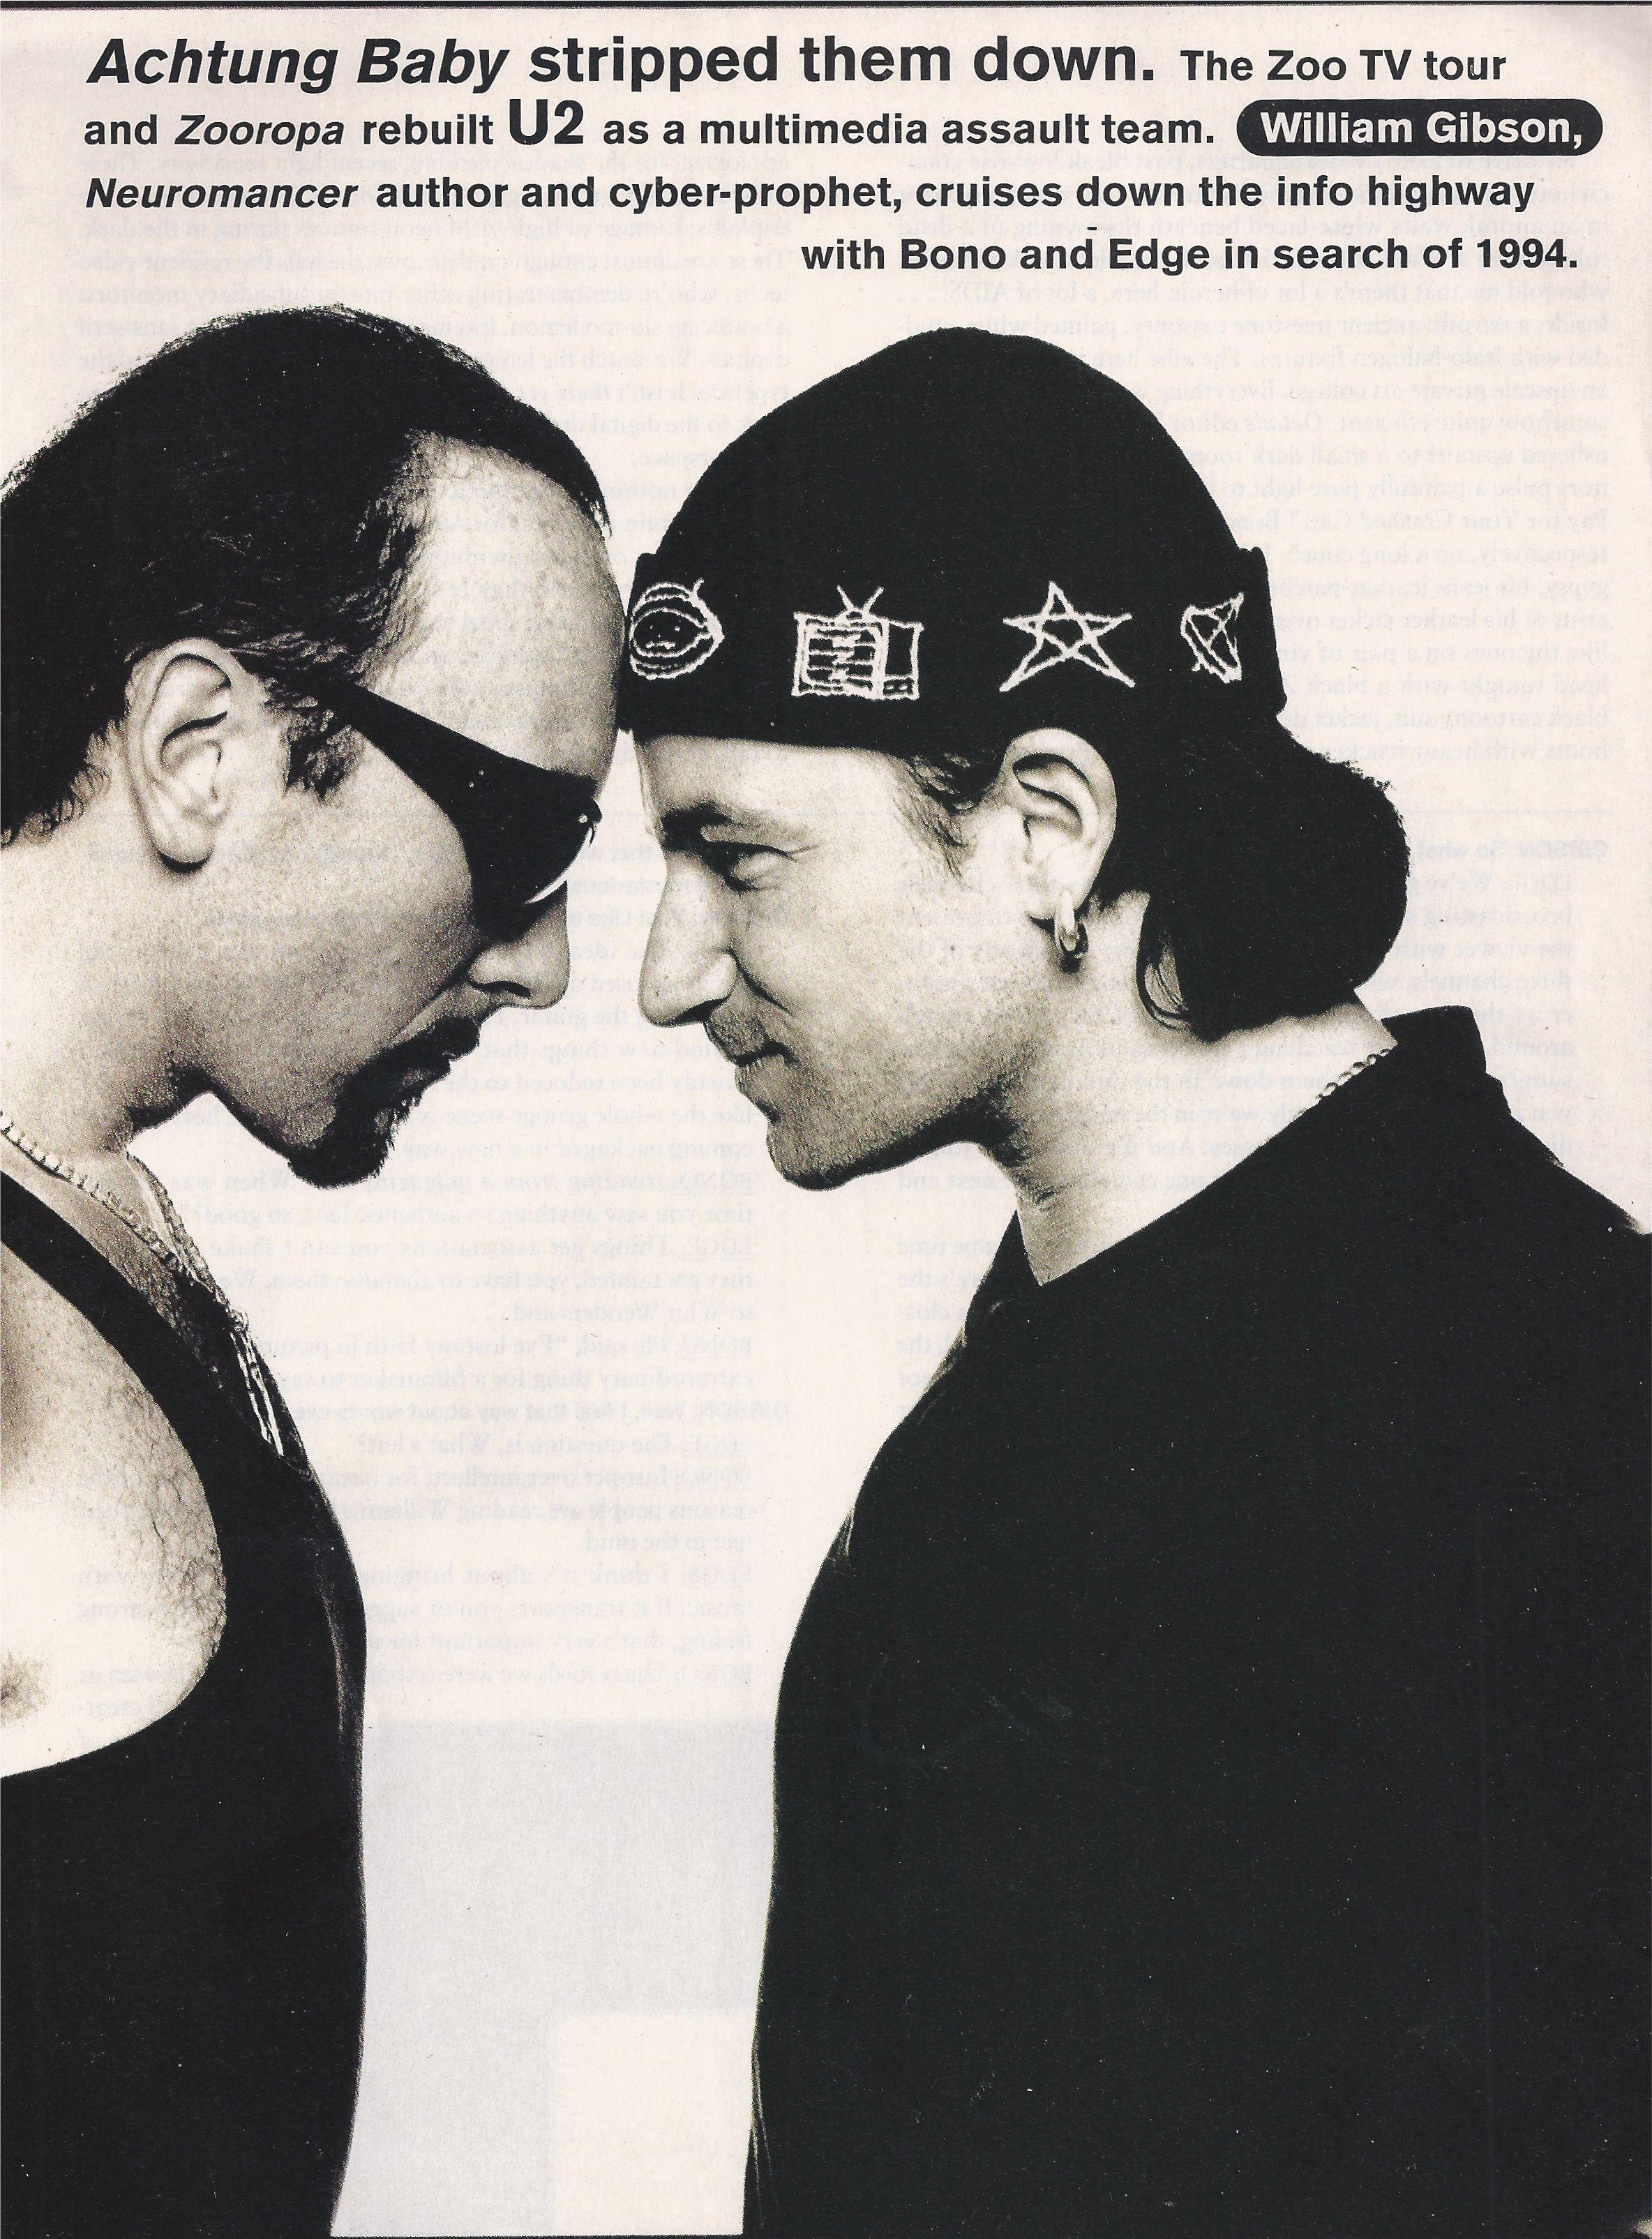 Ros Badger Handknit Amp Embroidered Hat For U2 Zooropa Tour Bono The Edge 1990 S Musica Rock Grupo De Musica Musica